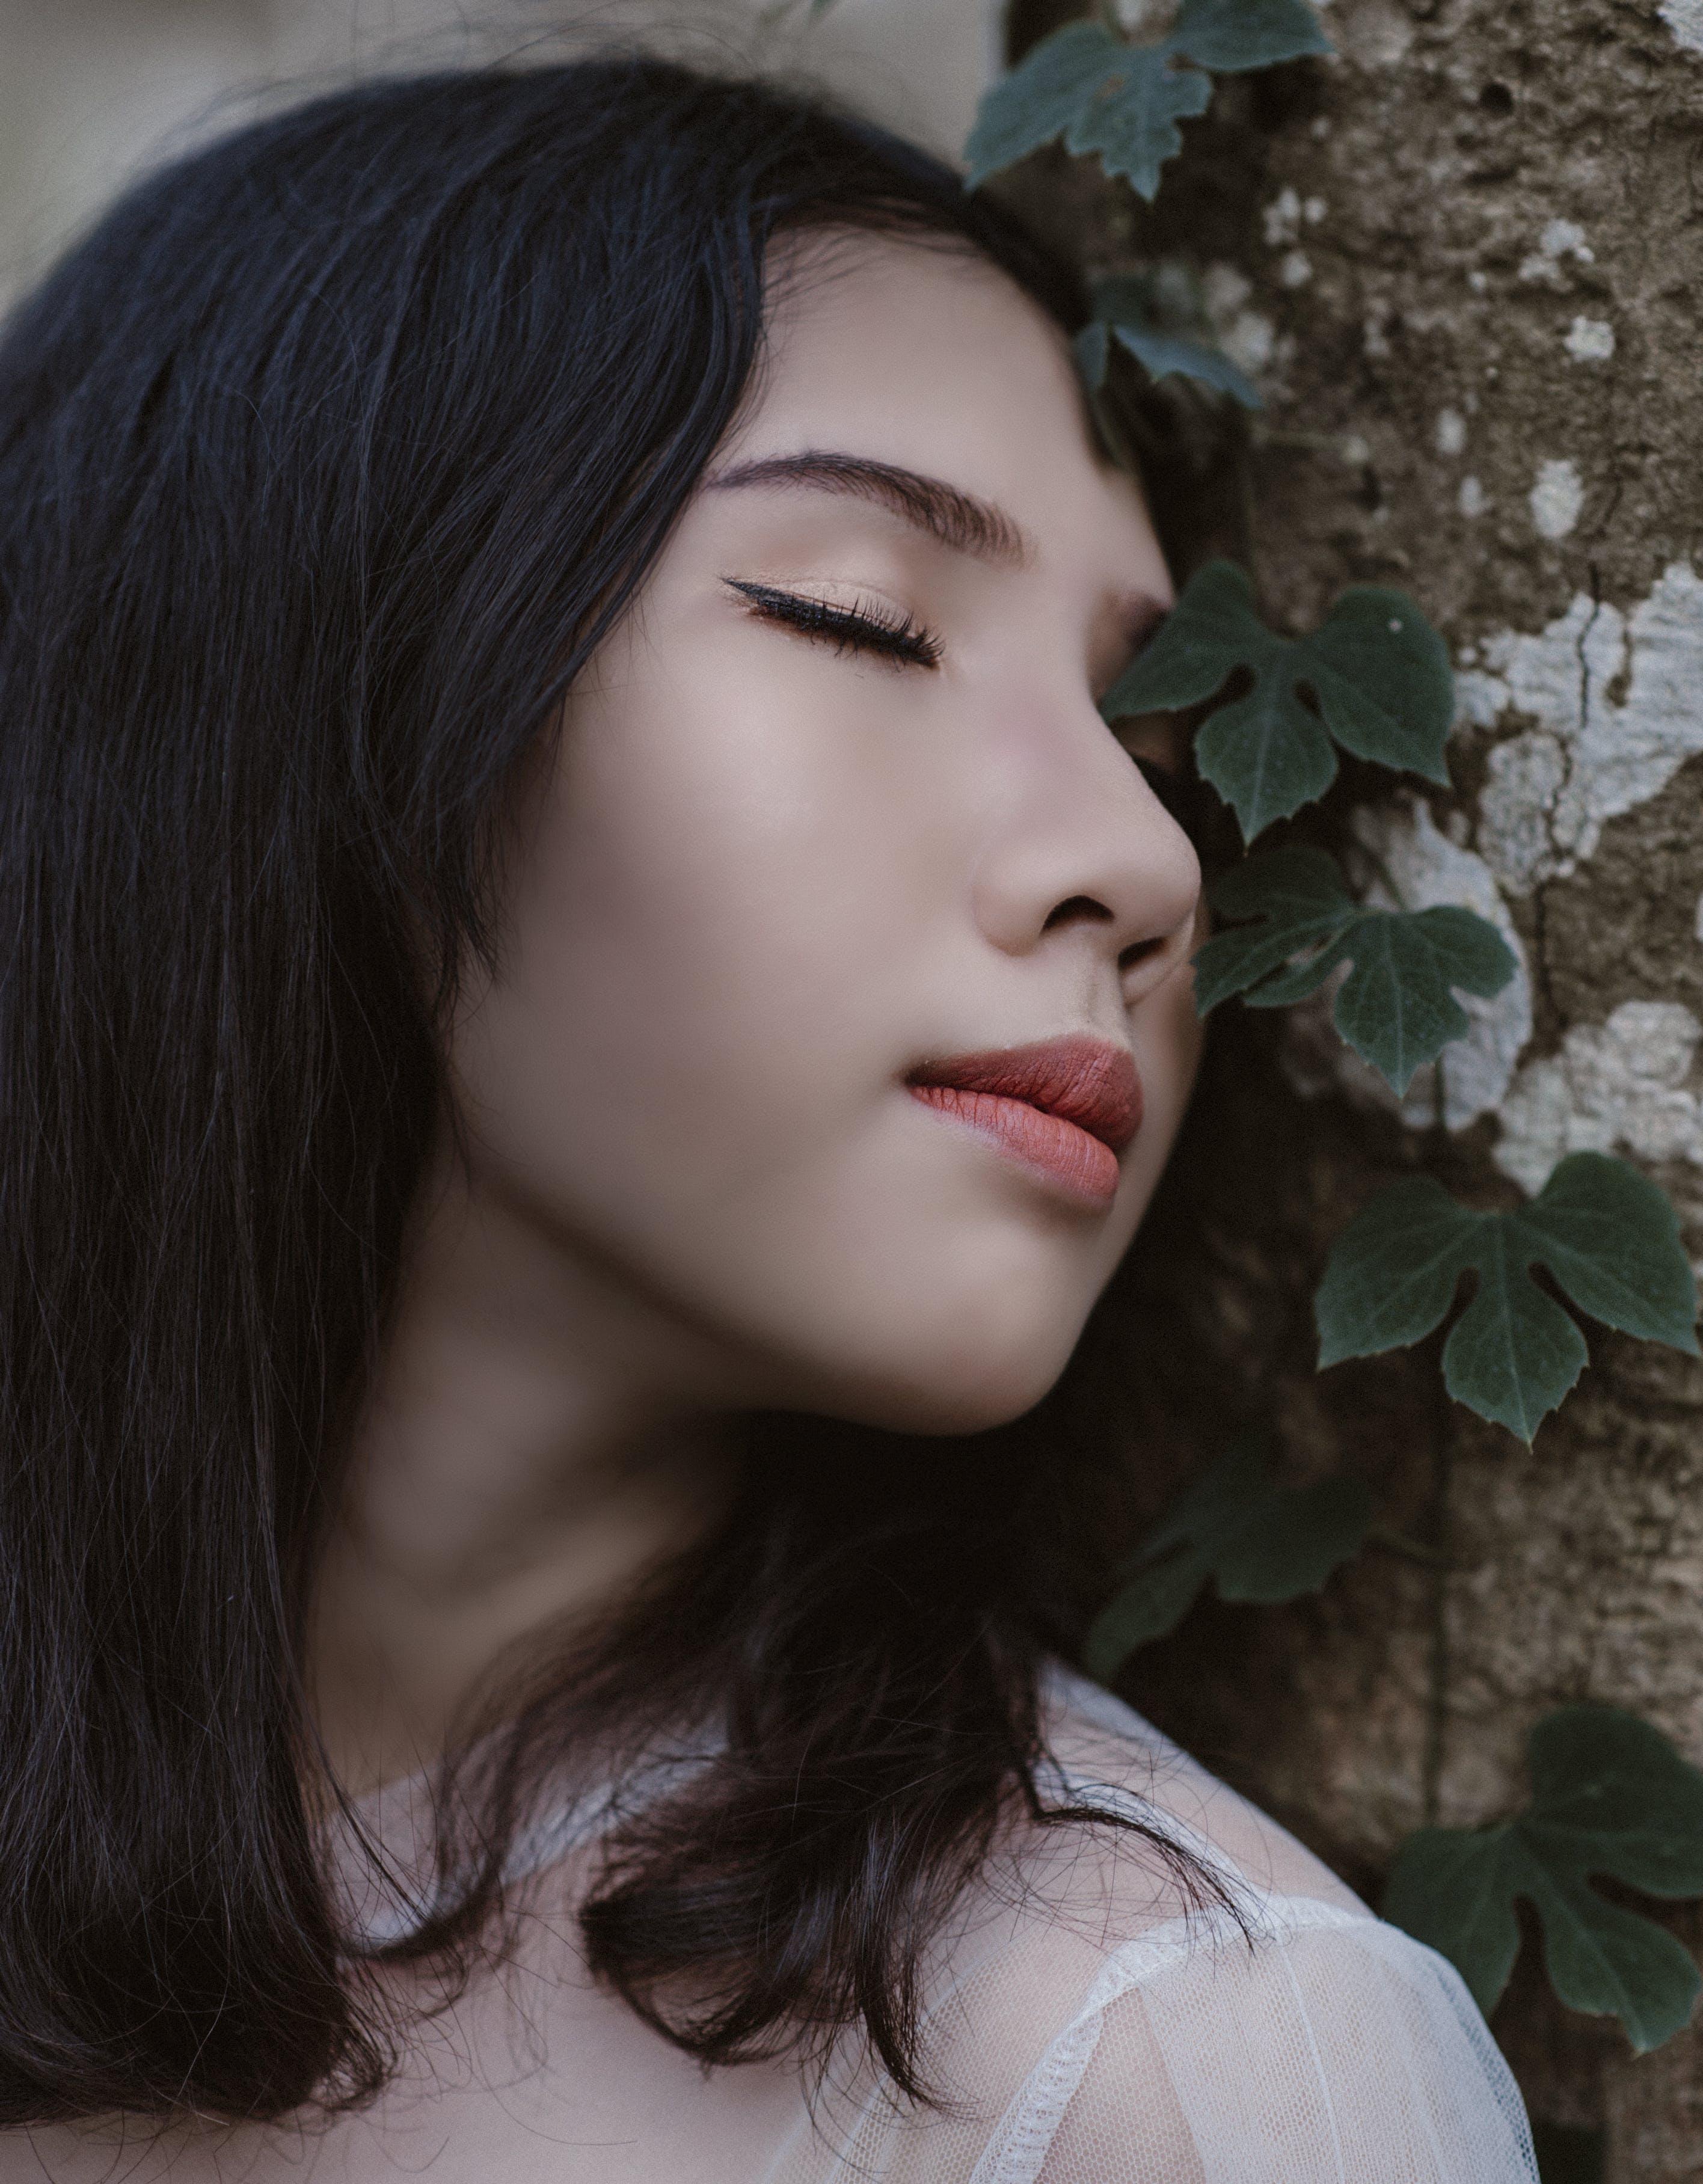 Woman Closing Her Eyes Beside Green Vine Plant